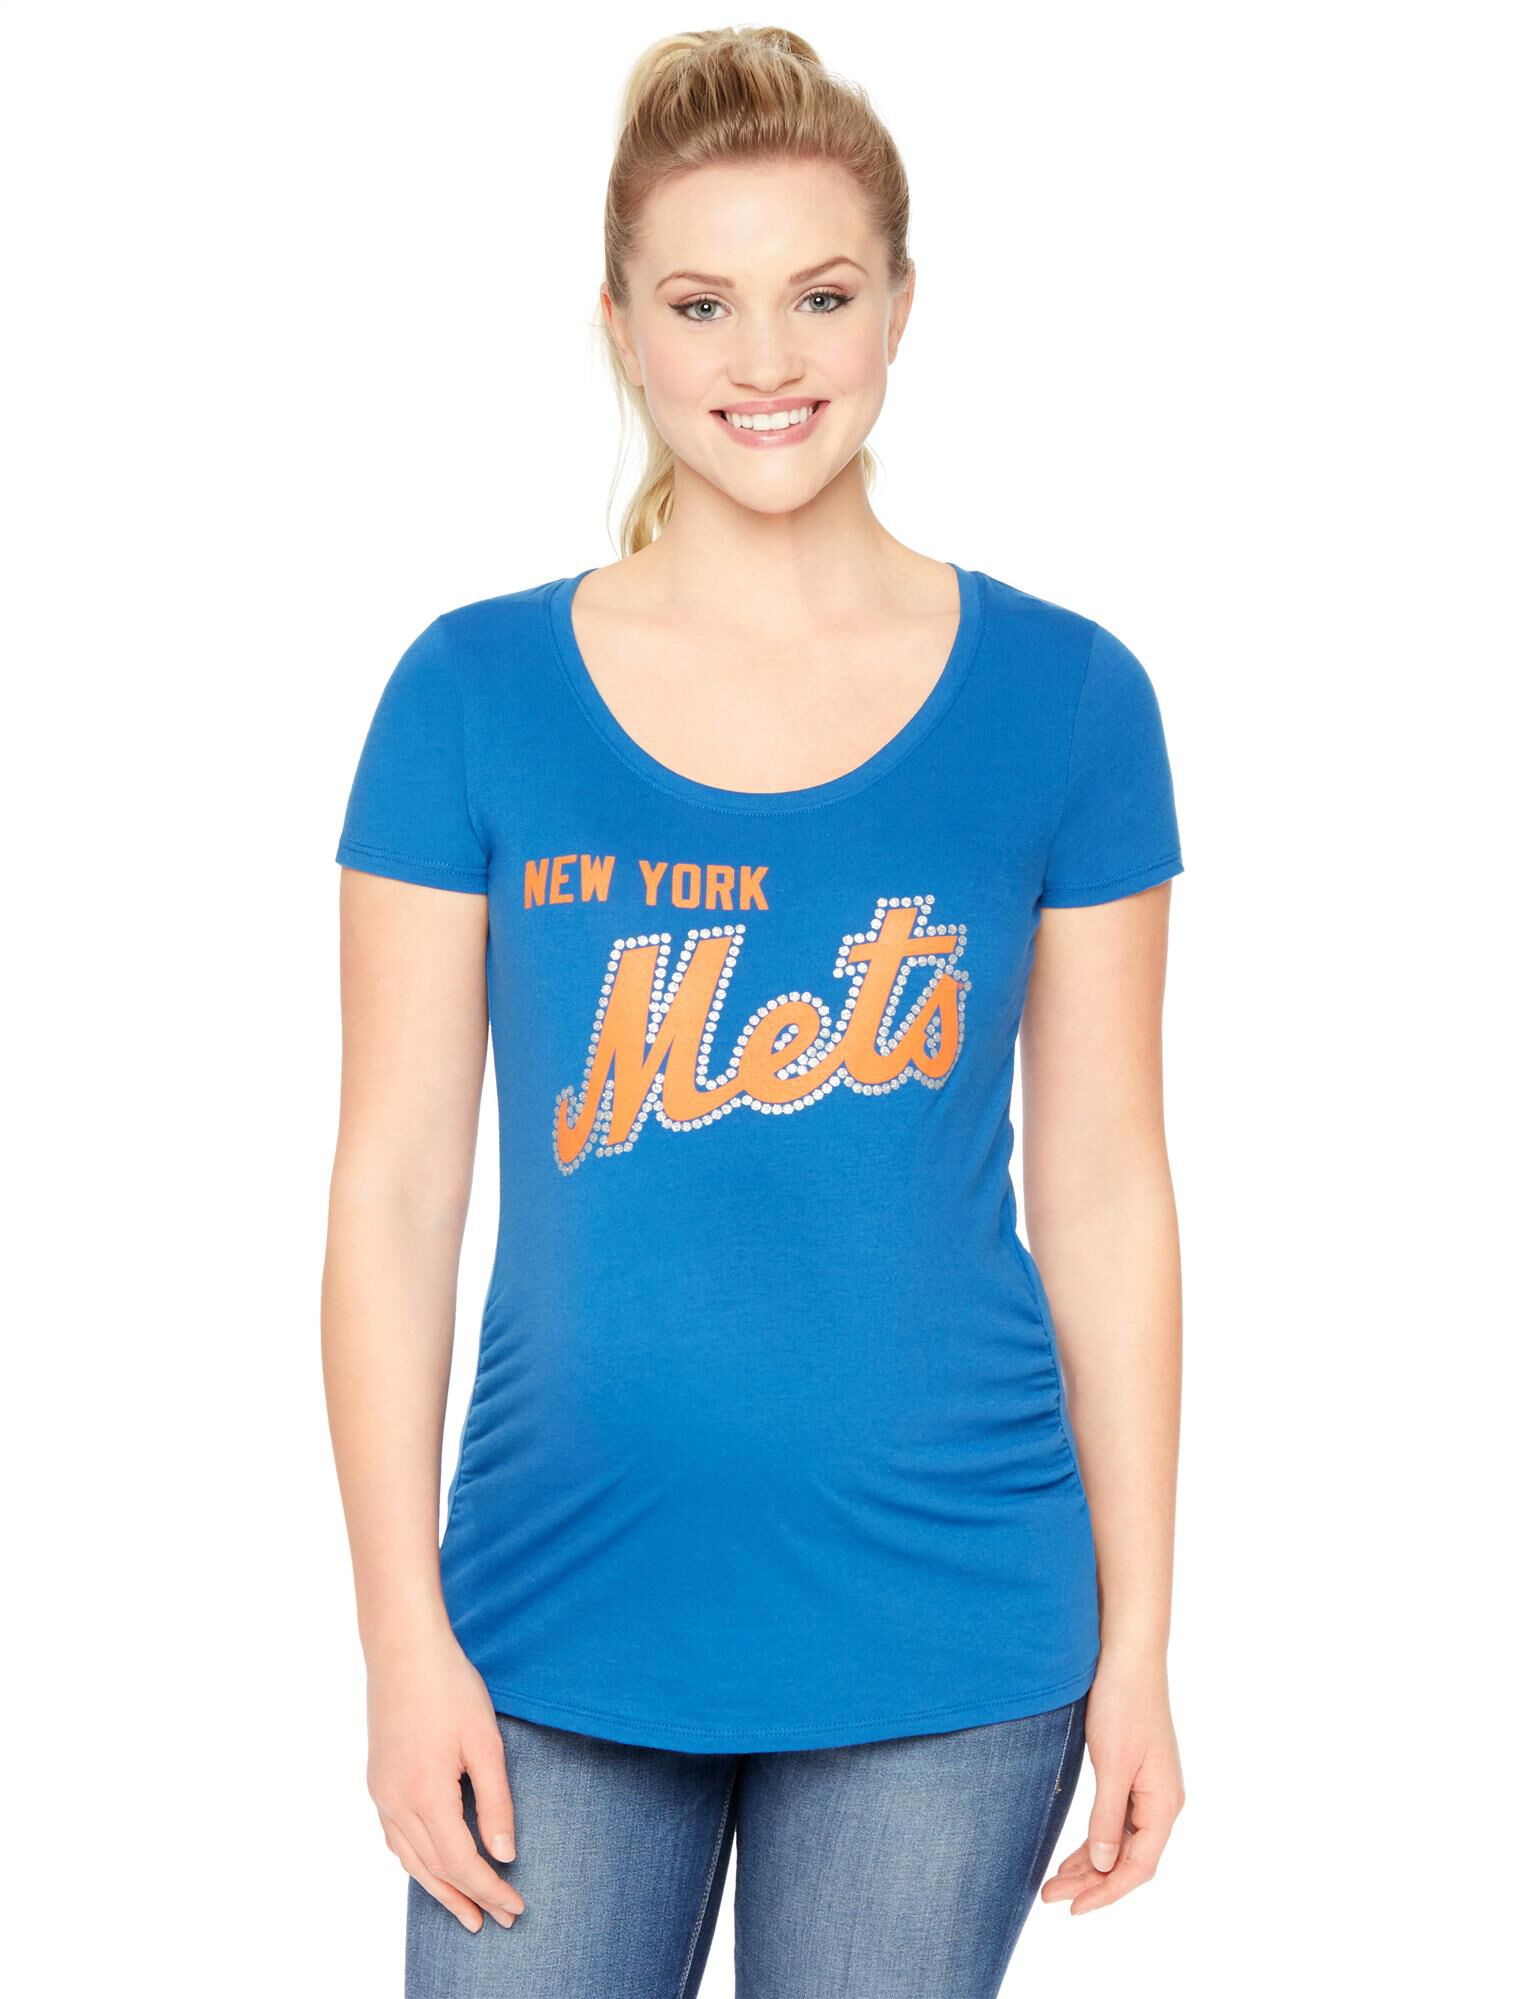 New York Mets MLB Short Sleeve Maternity Tee